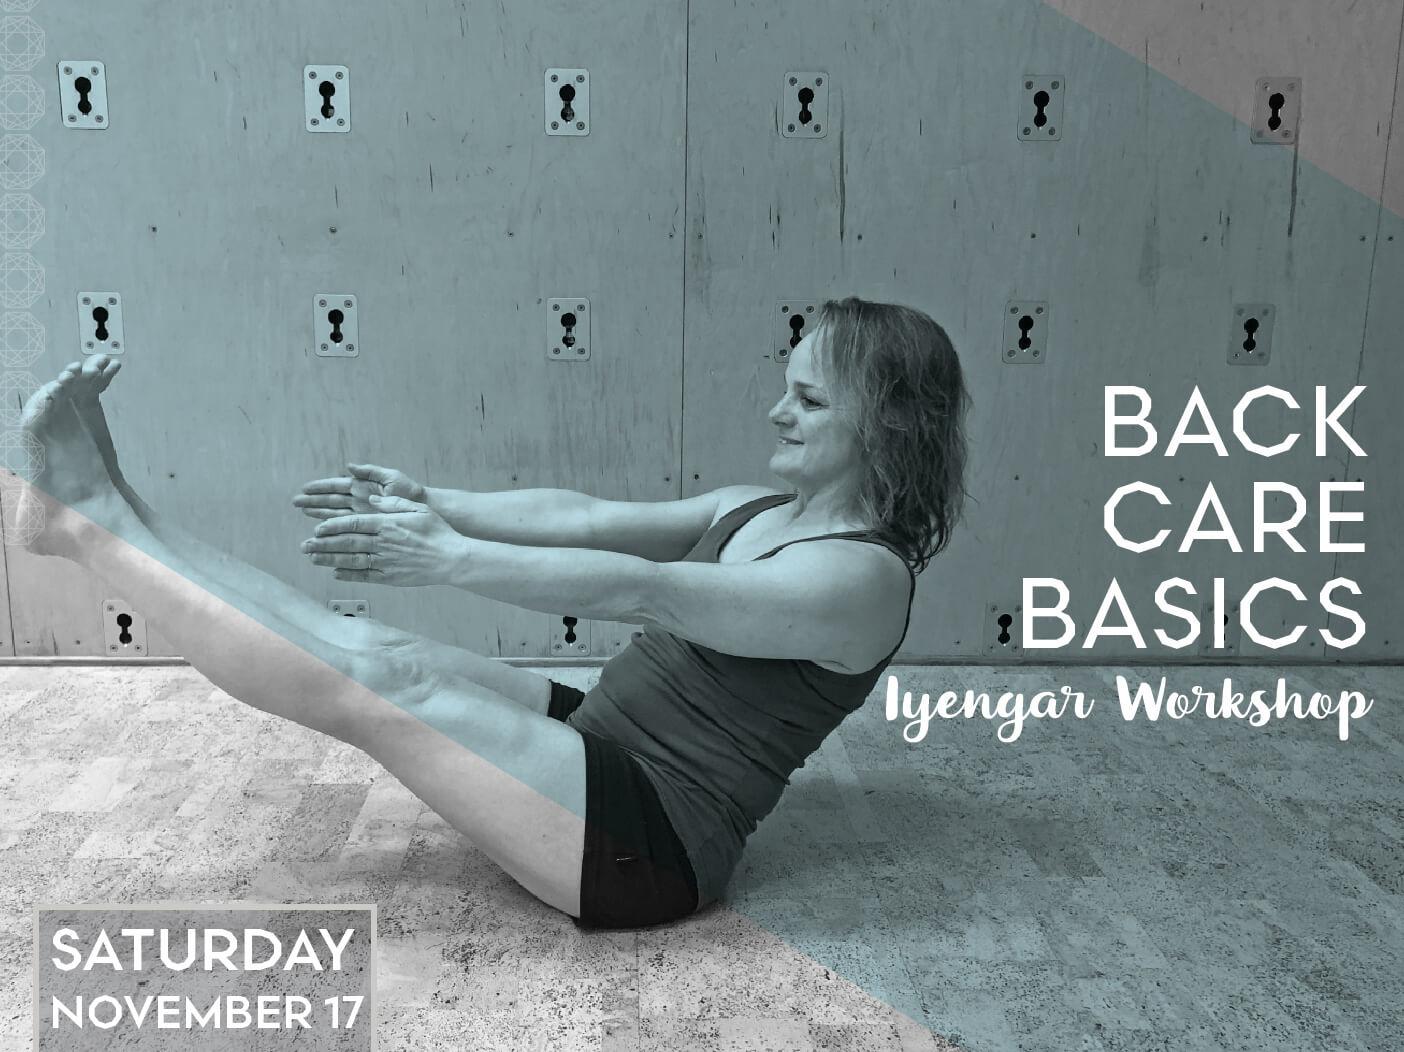 Back Care Basics: Iyengar Workshop